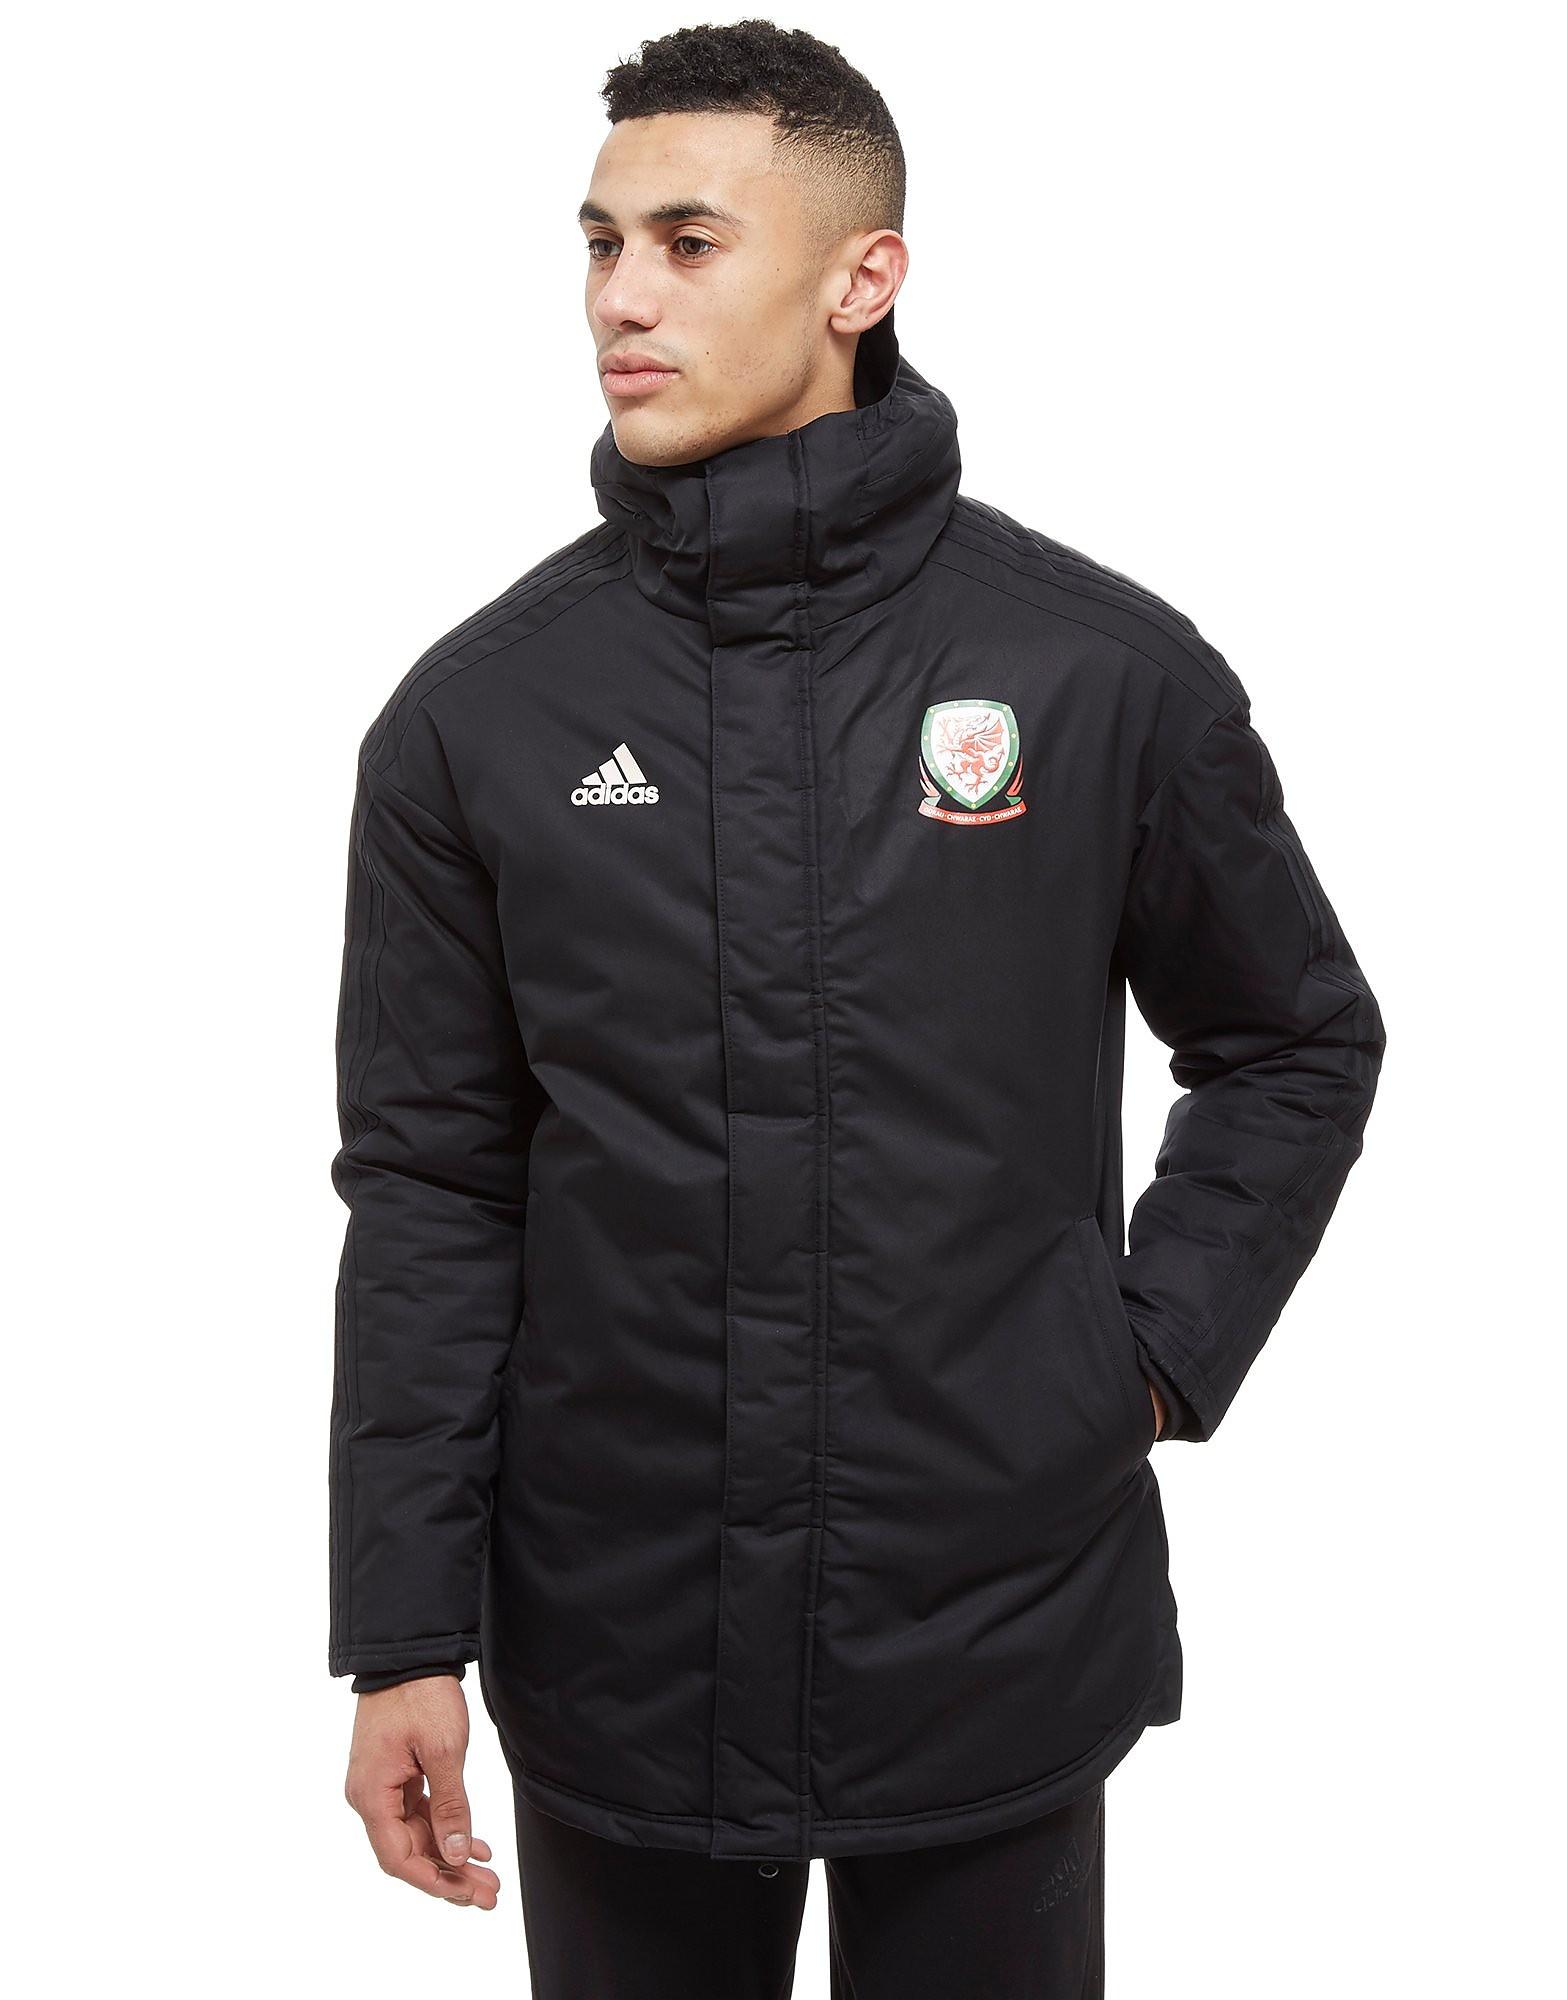 adidas FA Wales 2018 Parka Jacket